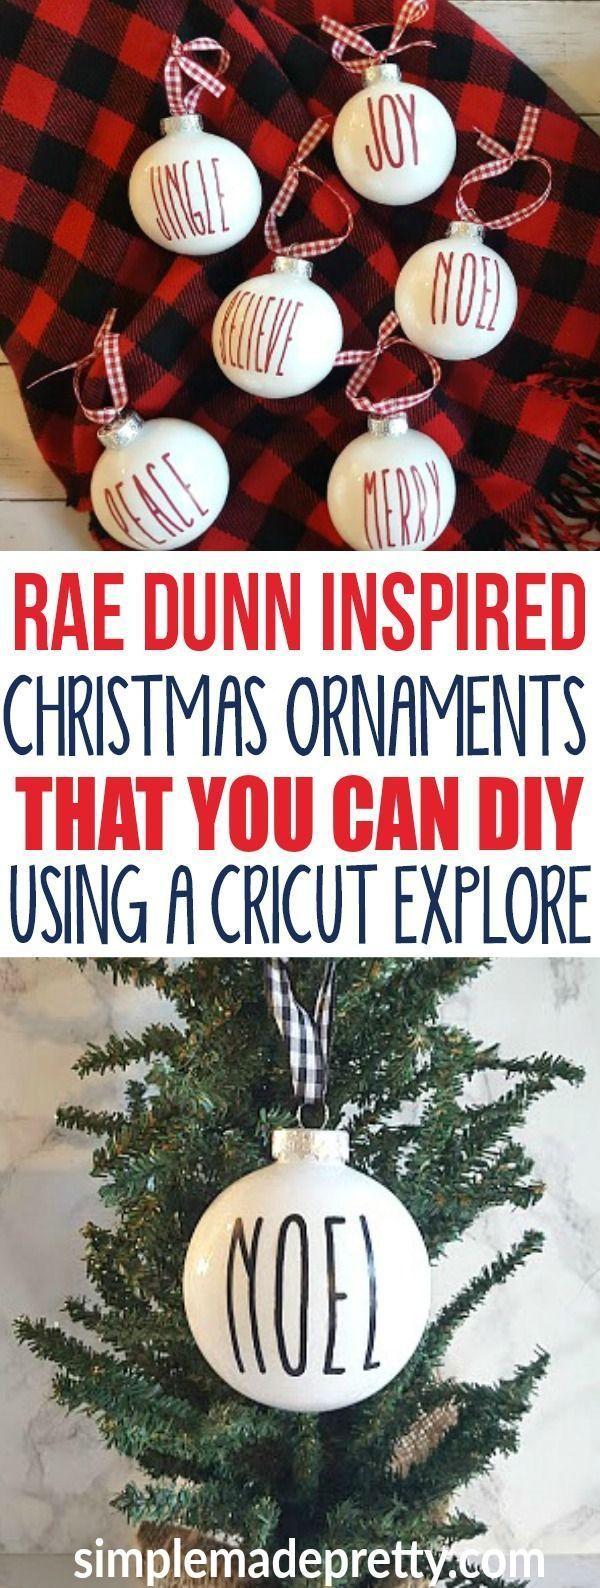 DIY Rae Dunn inspirierte Weihnachtsverzierungen